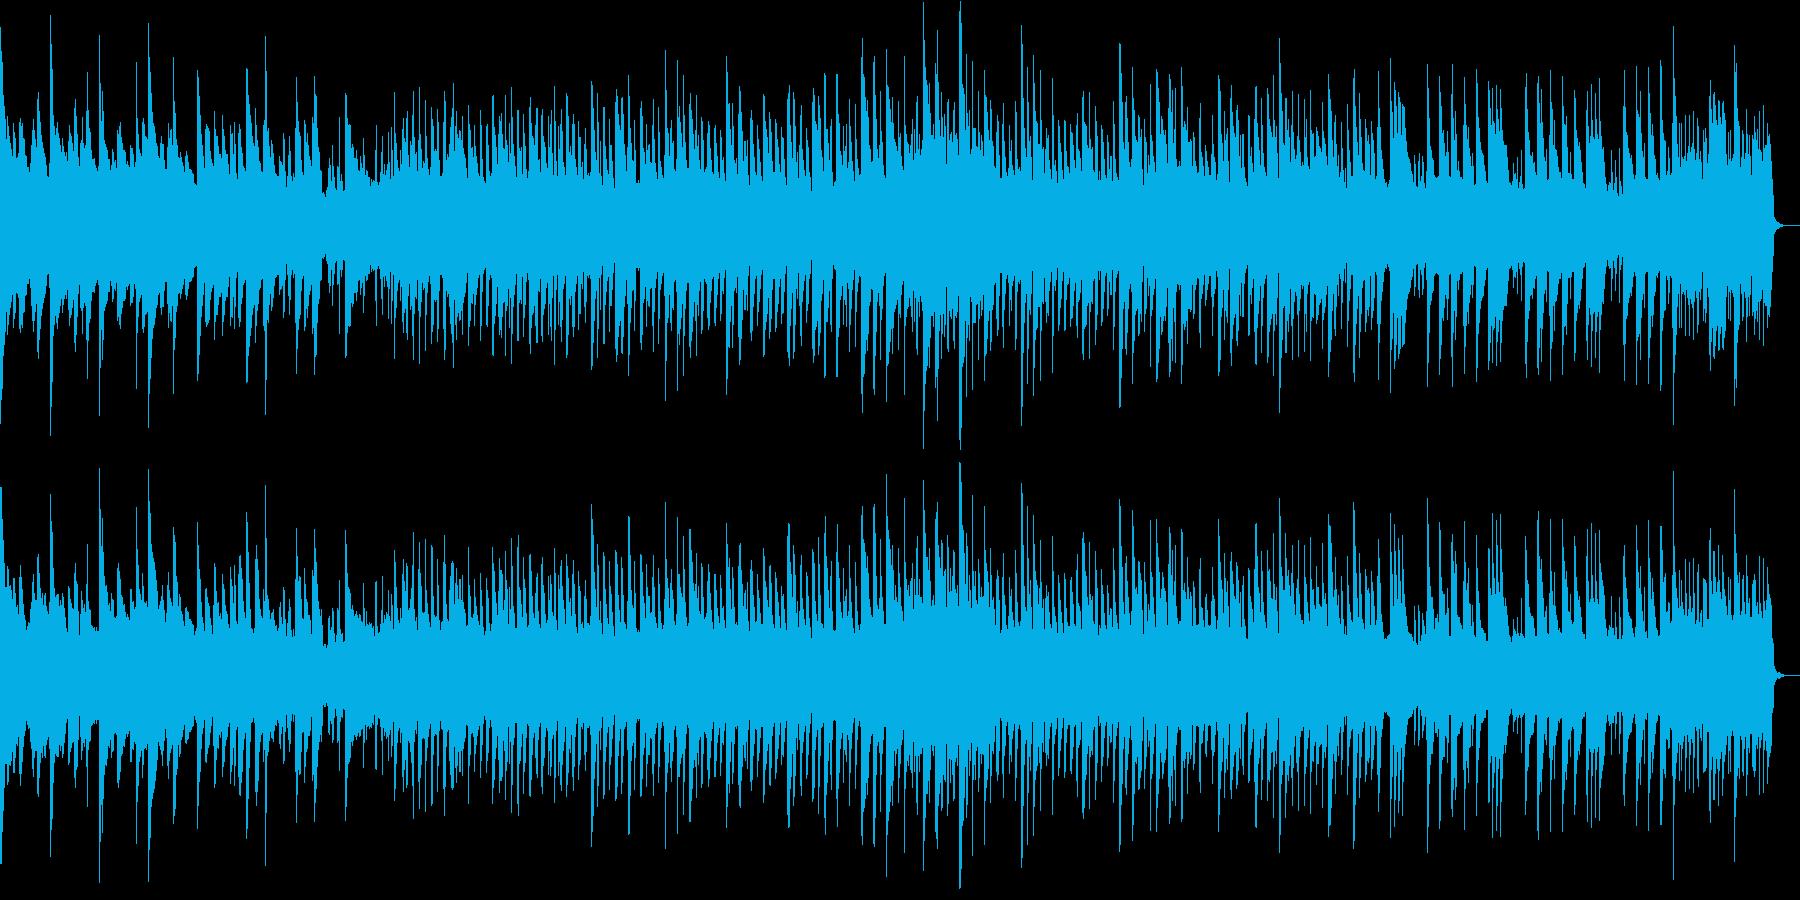 8bit 切なくファンタジー 1コーラスの再生済みの波形